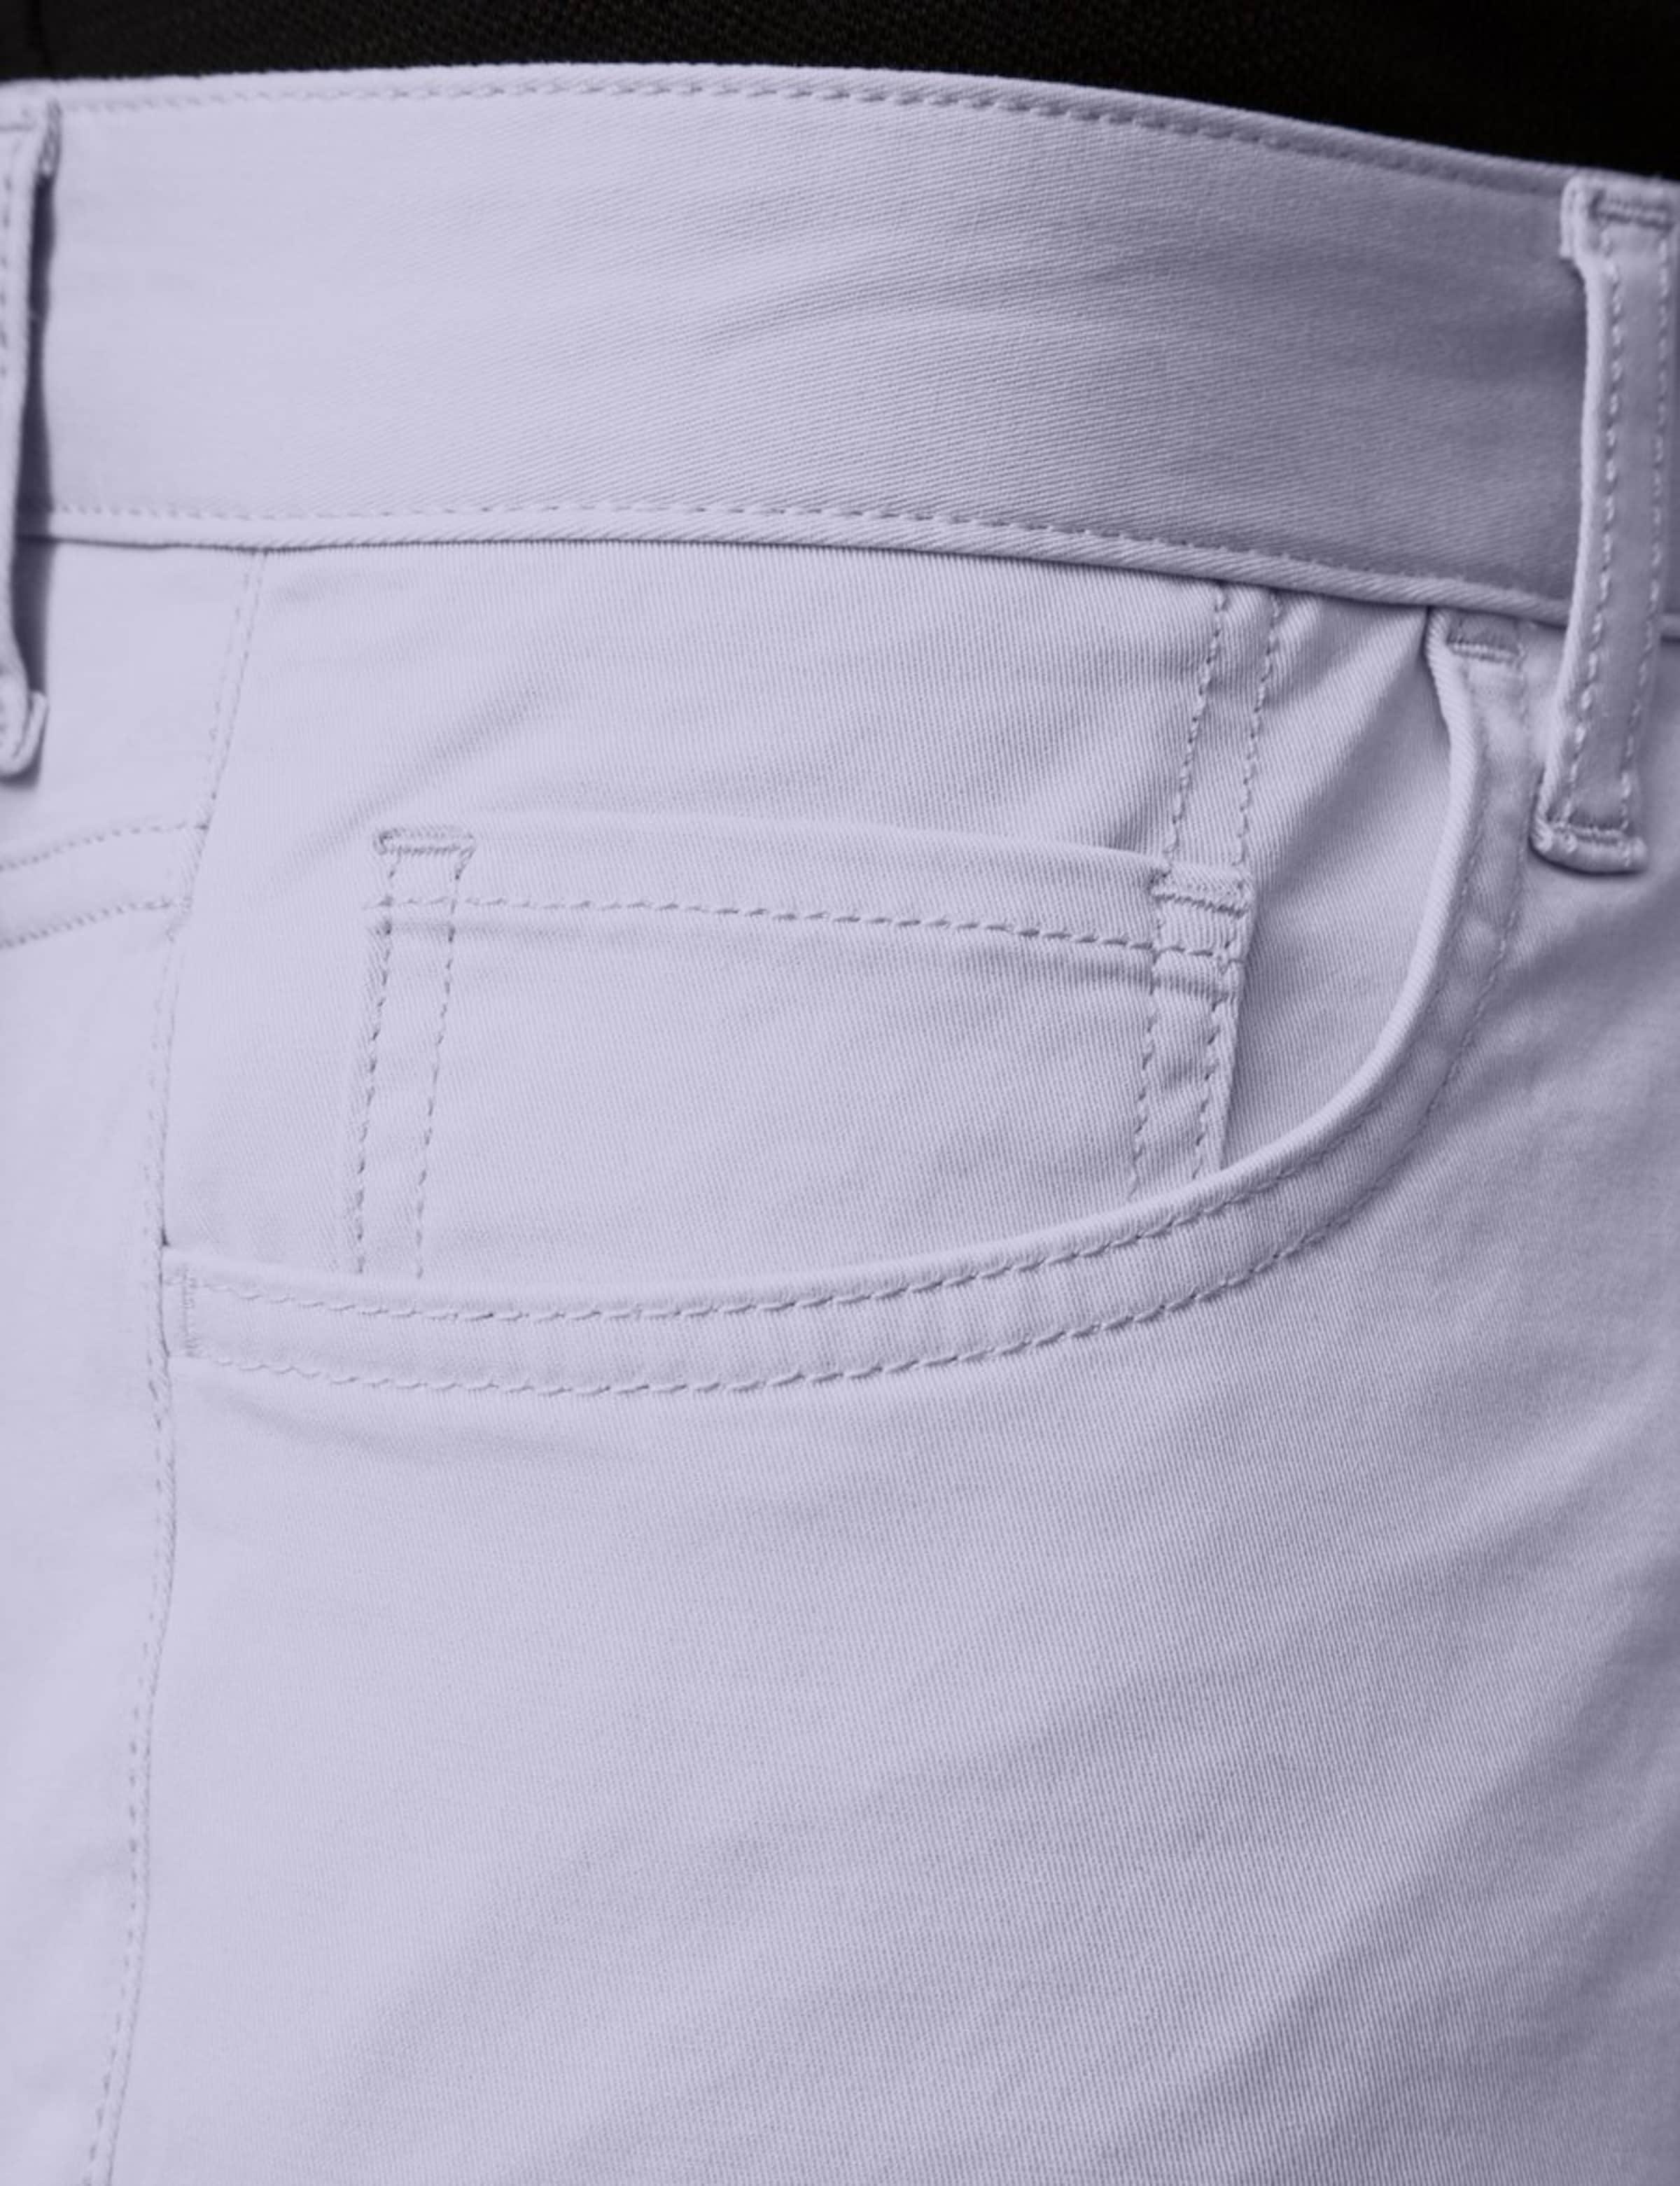 J.Lindeberg Twill-Jeans 'Grant' Angebote Online-Verkauf n96SlmTtYJ